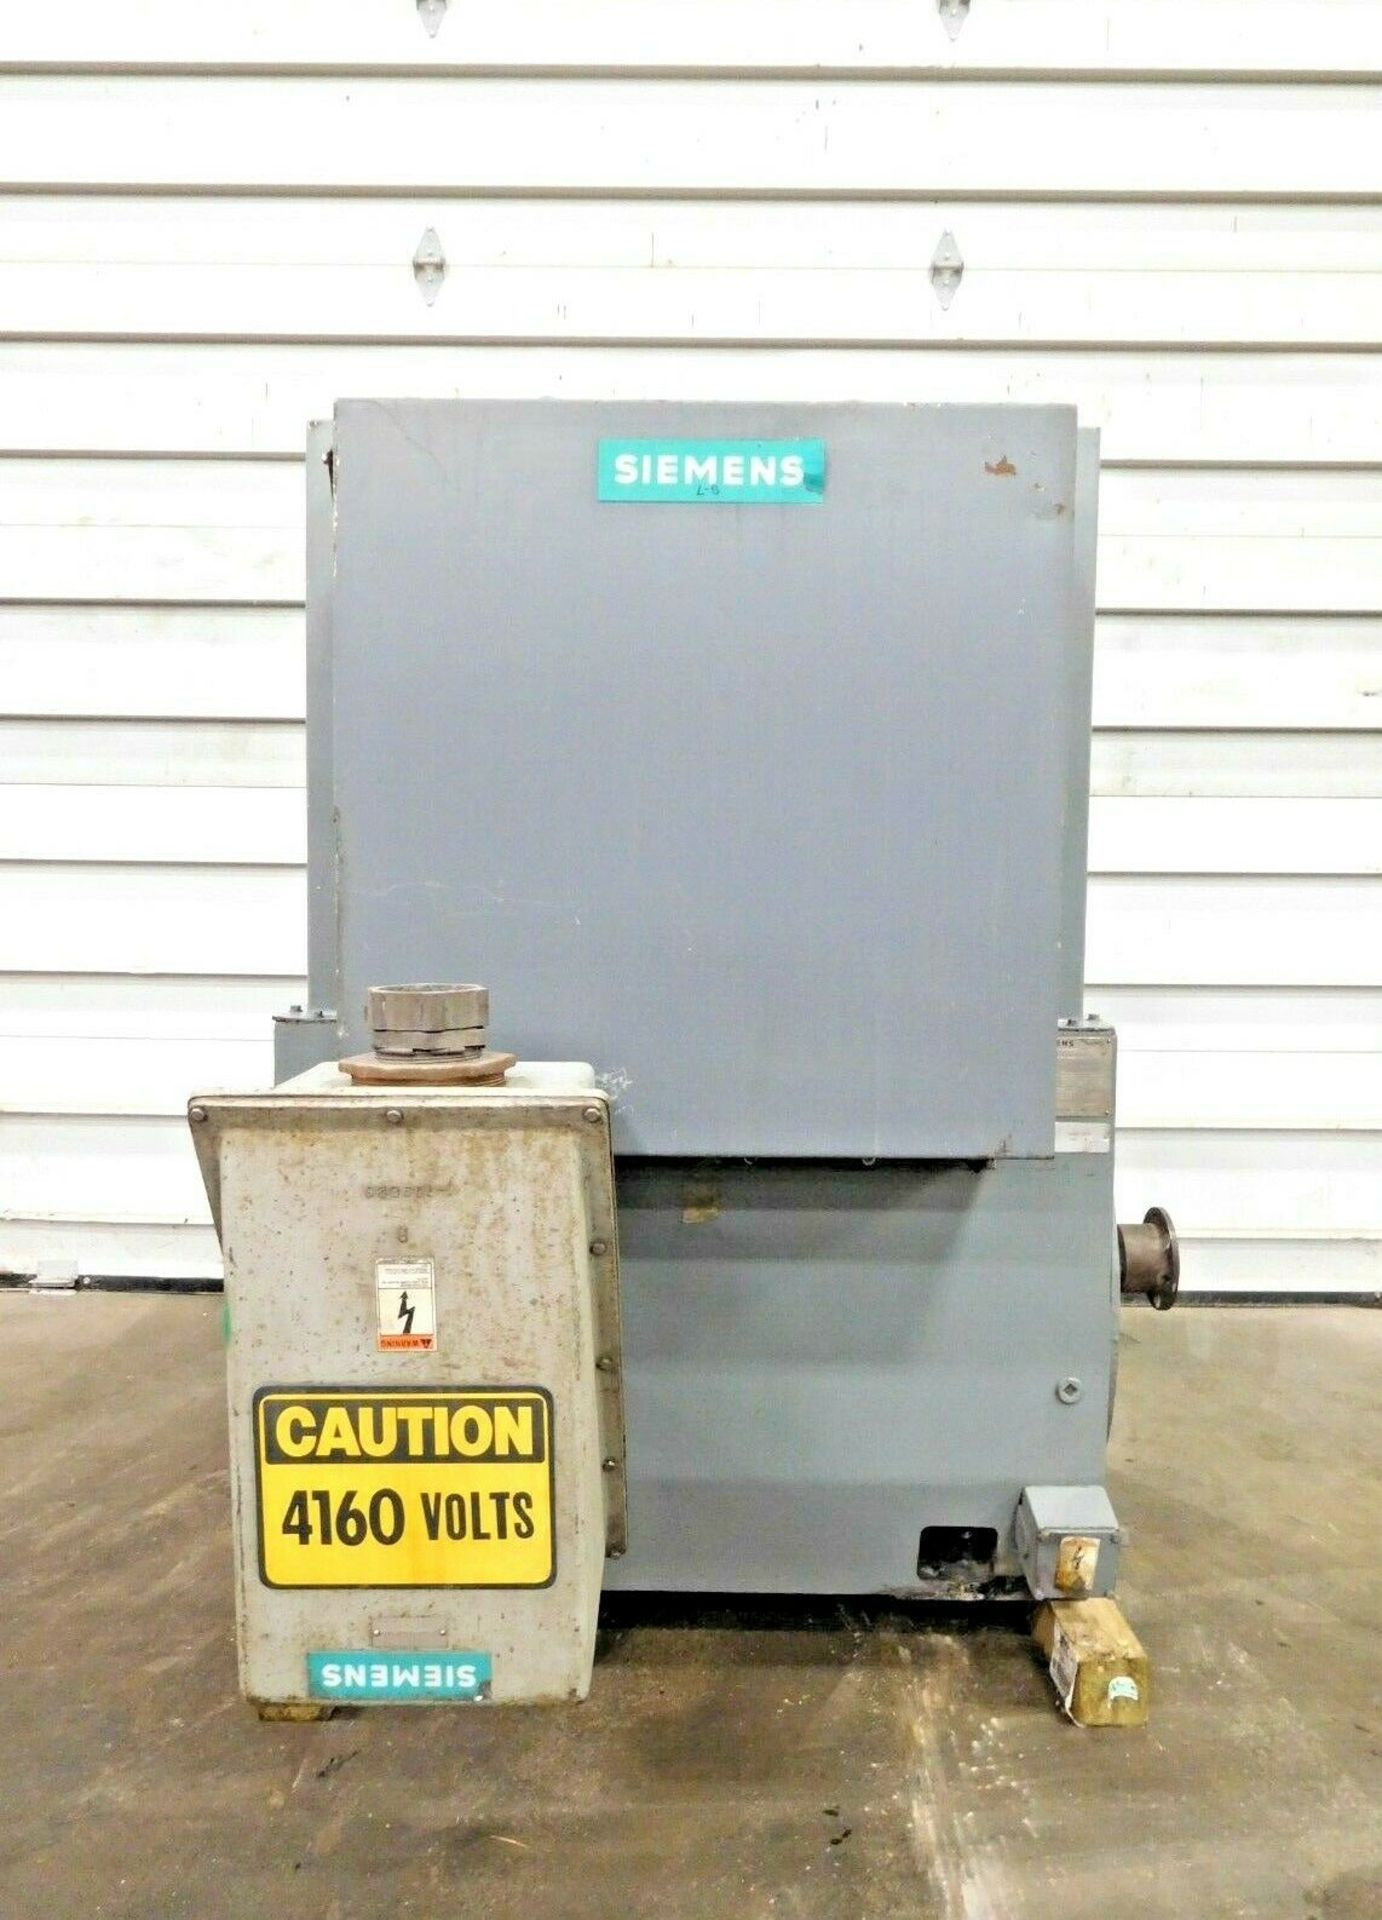 Siemens 1000 HP Induction Motor. 3 Ph. 3570 RPM. 4000 V. 60 Hz. 588US. FODS.